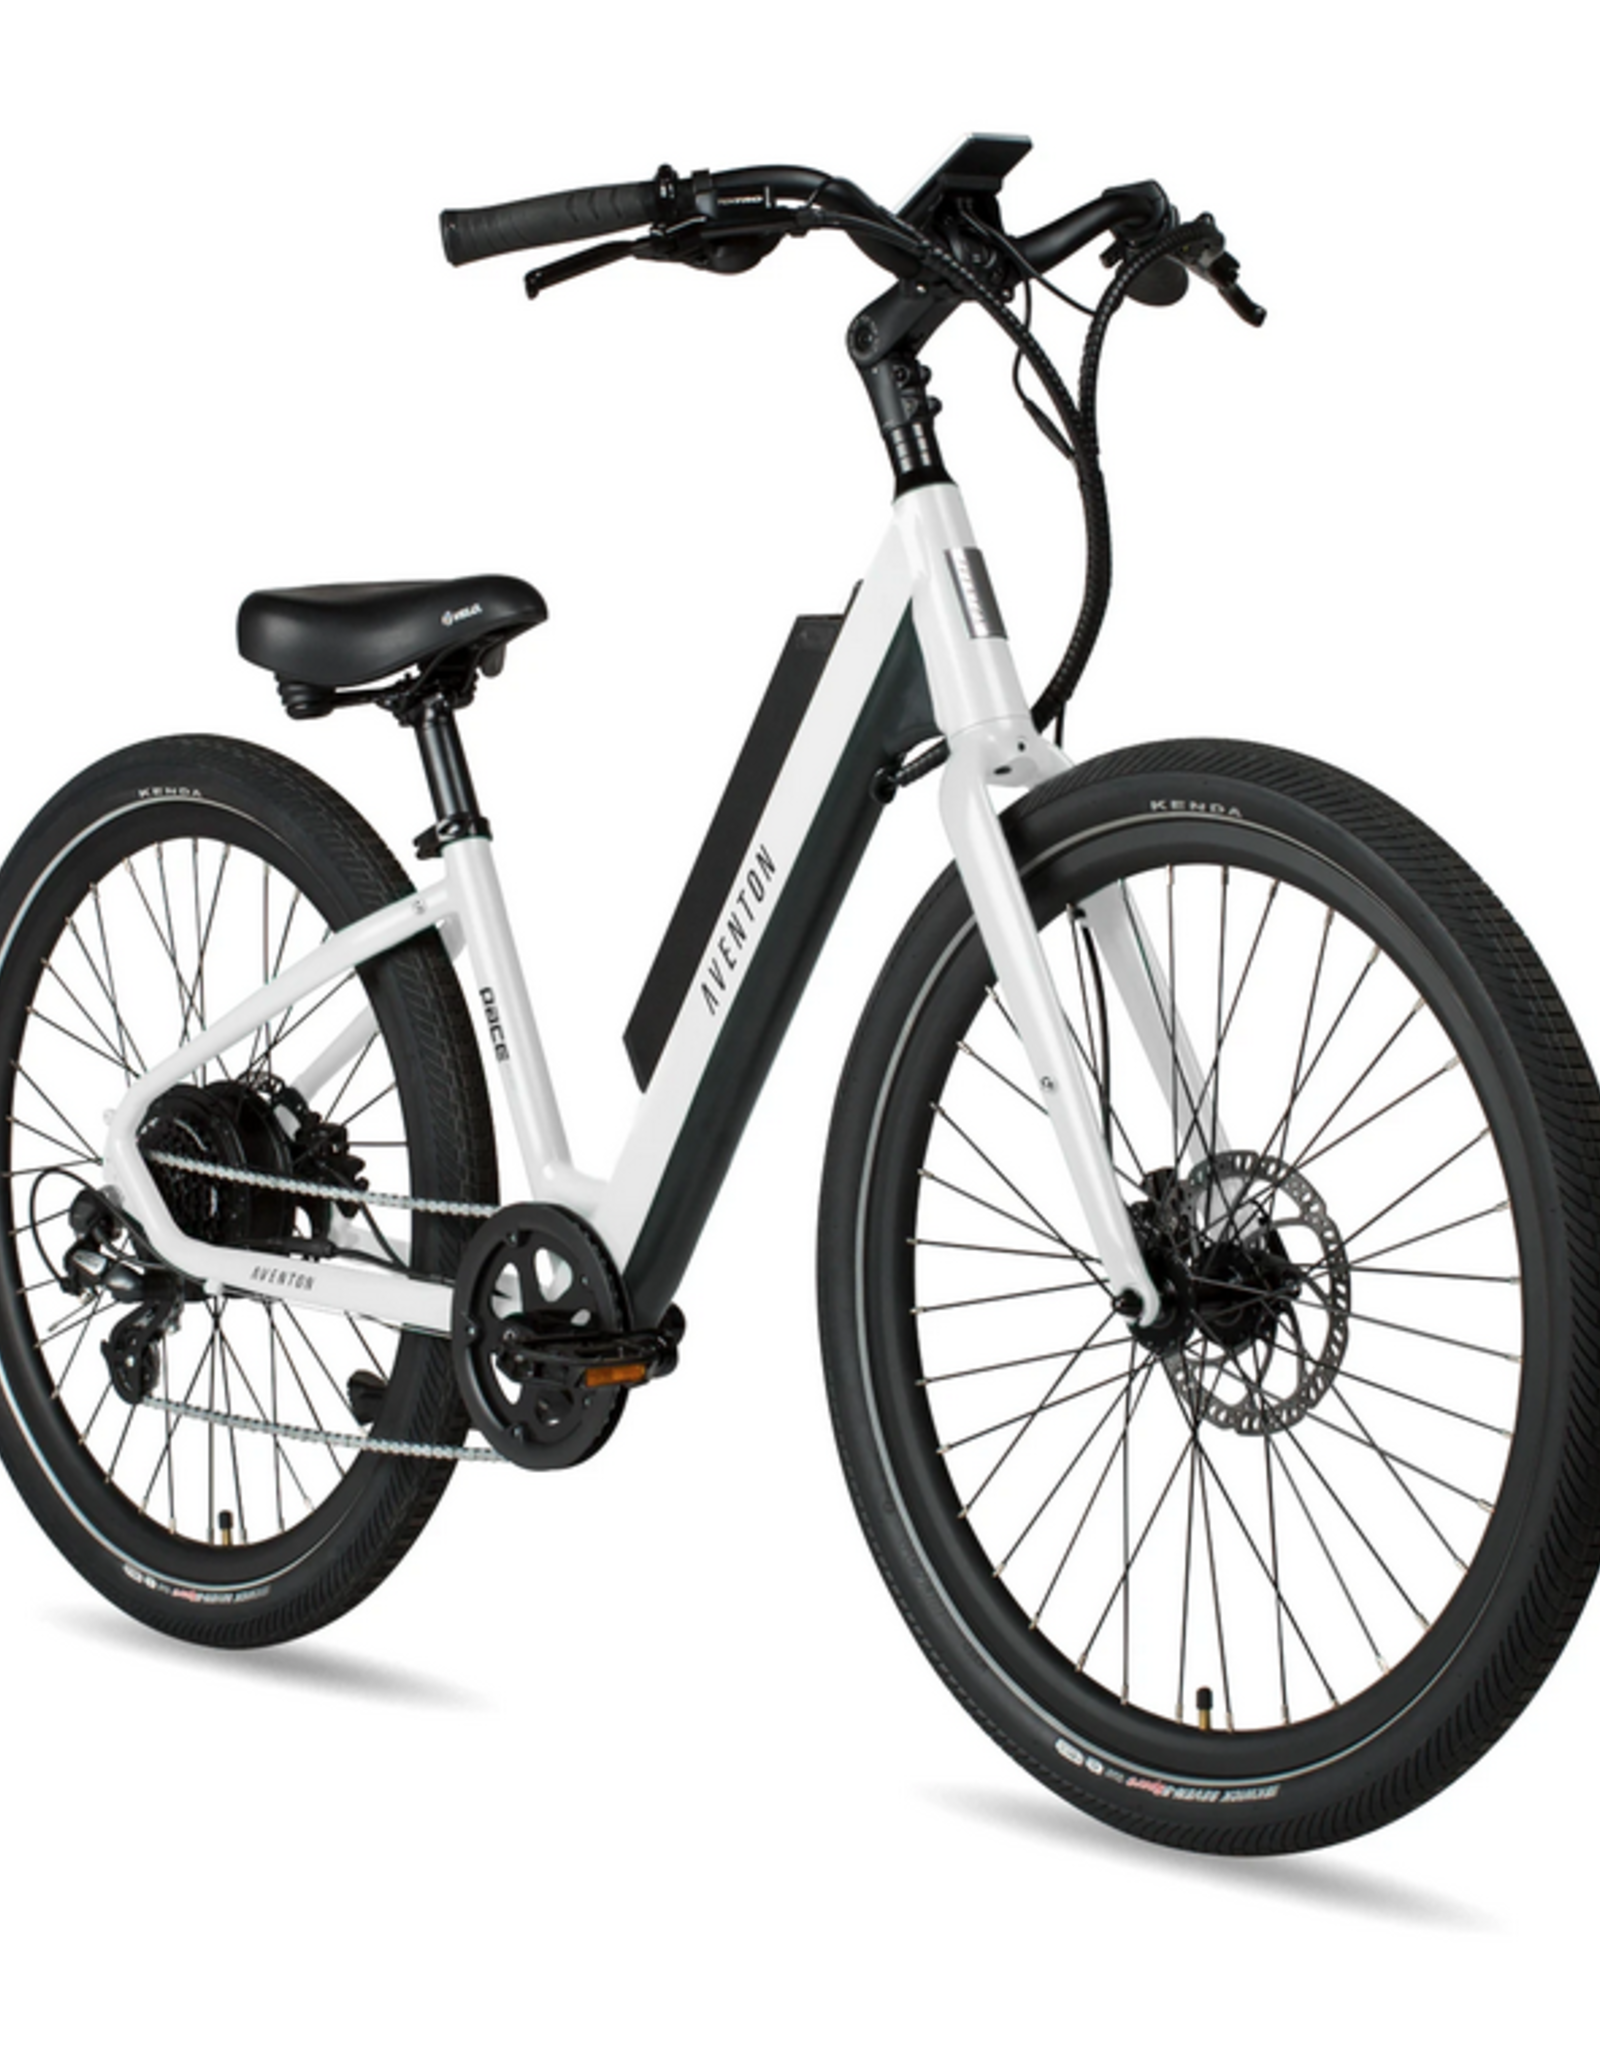 Aventon Aventon Pace 500 st Complete Bike